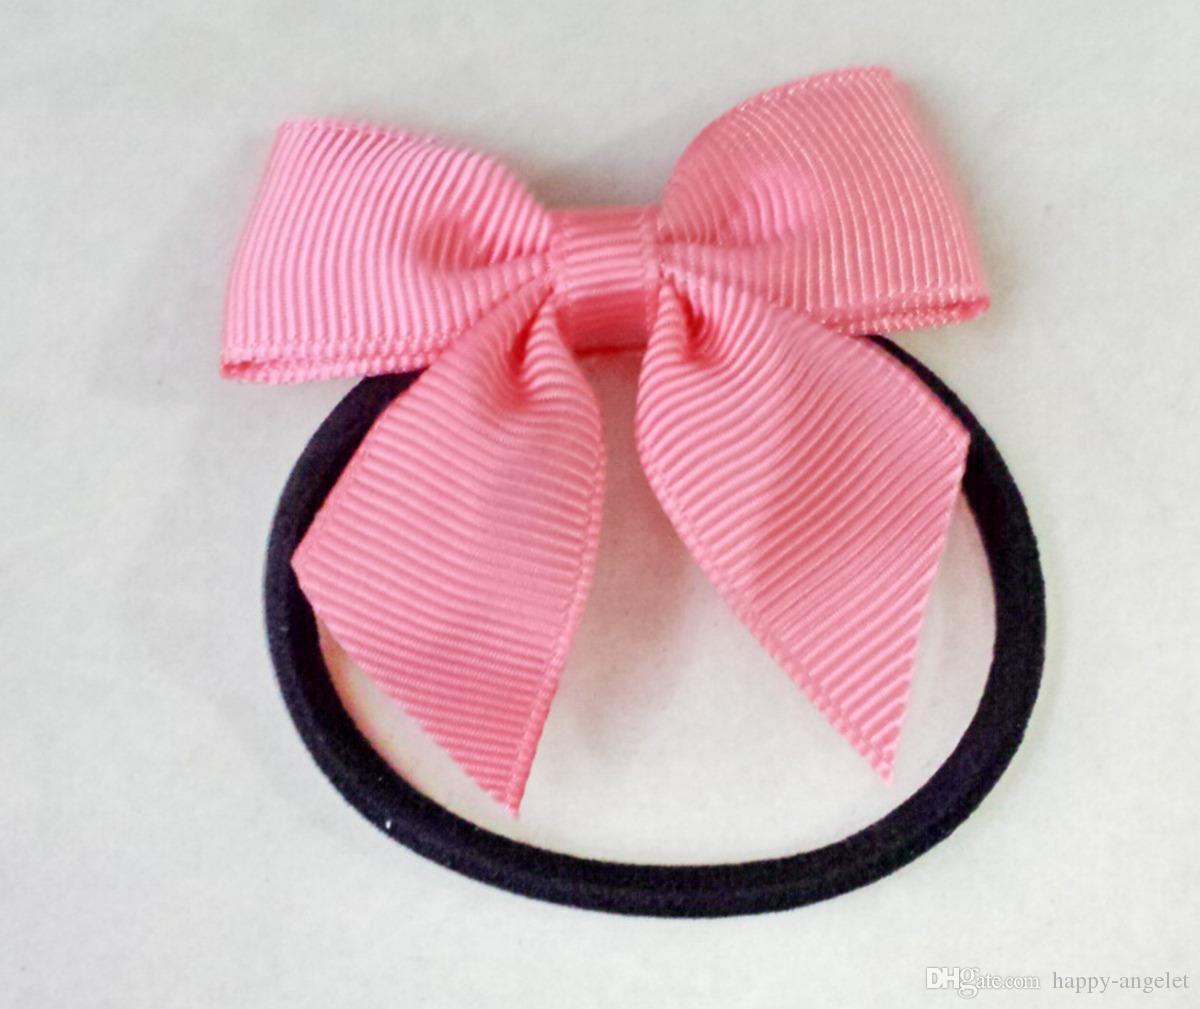 "Baby Girl 2"" mini Hairbow Hair Bows Clips Kids Boutique grosgrain Ribbon bowknot Alligator Hairpin headwear Accessaries HD3303"